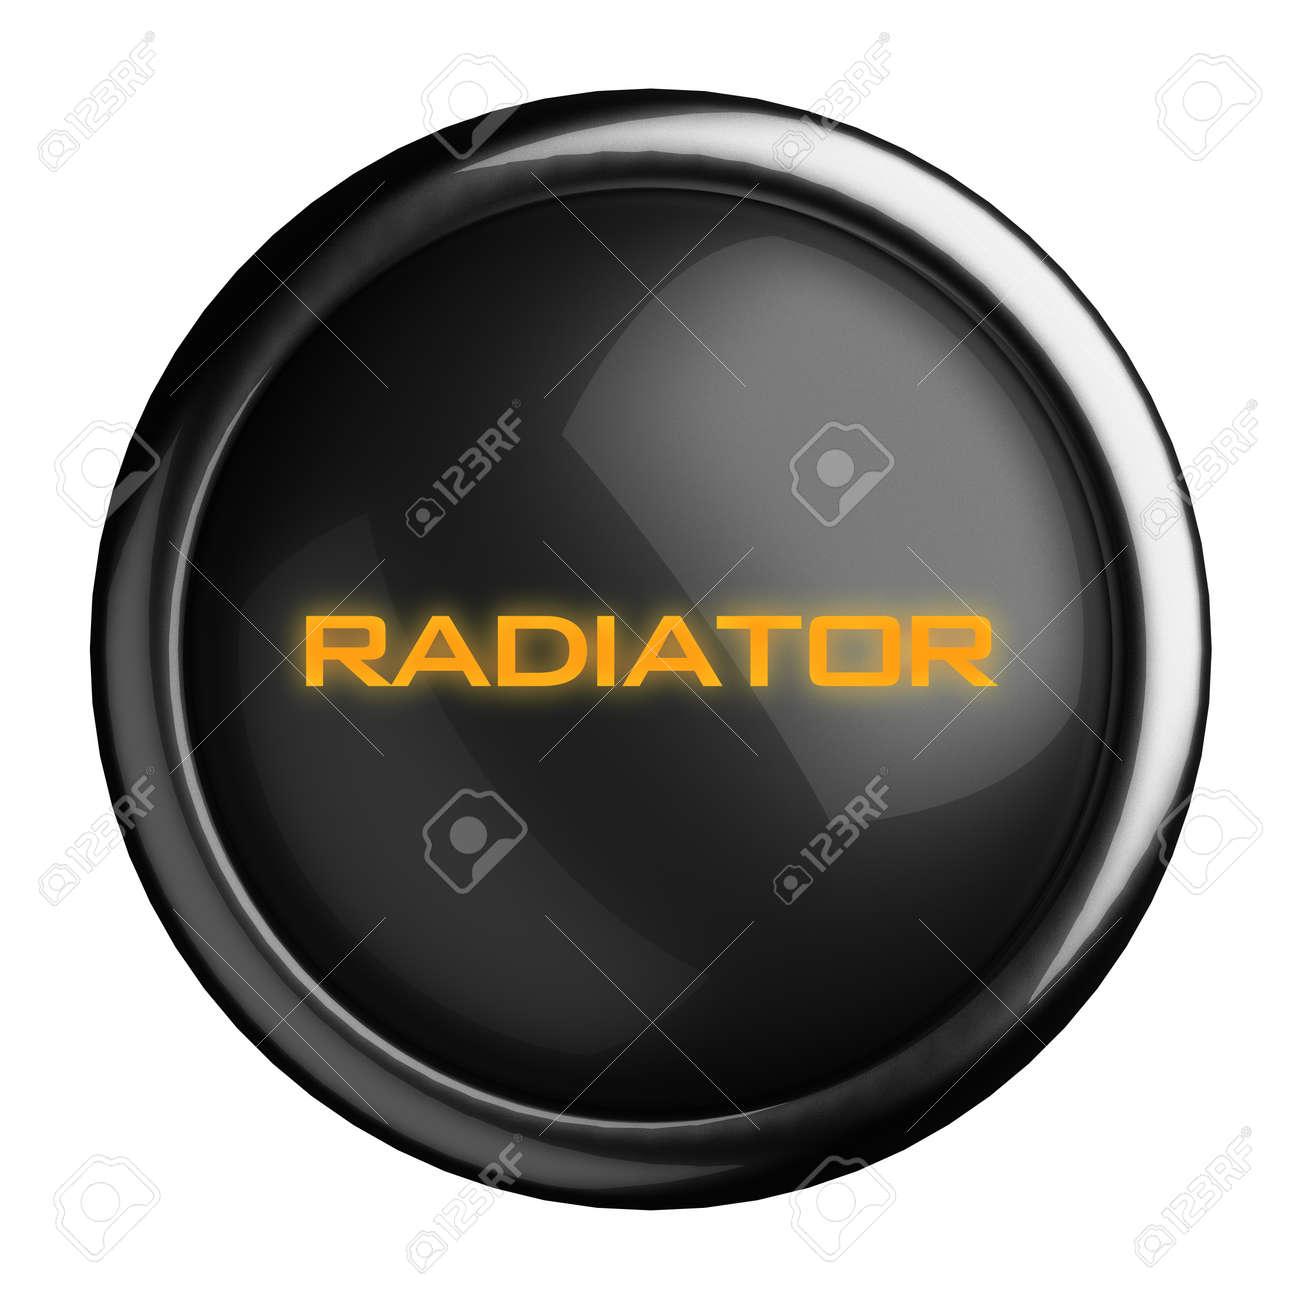 Word on black button Stock Photo - 15710348